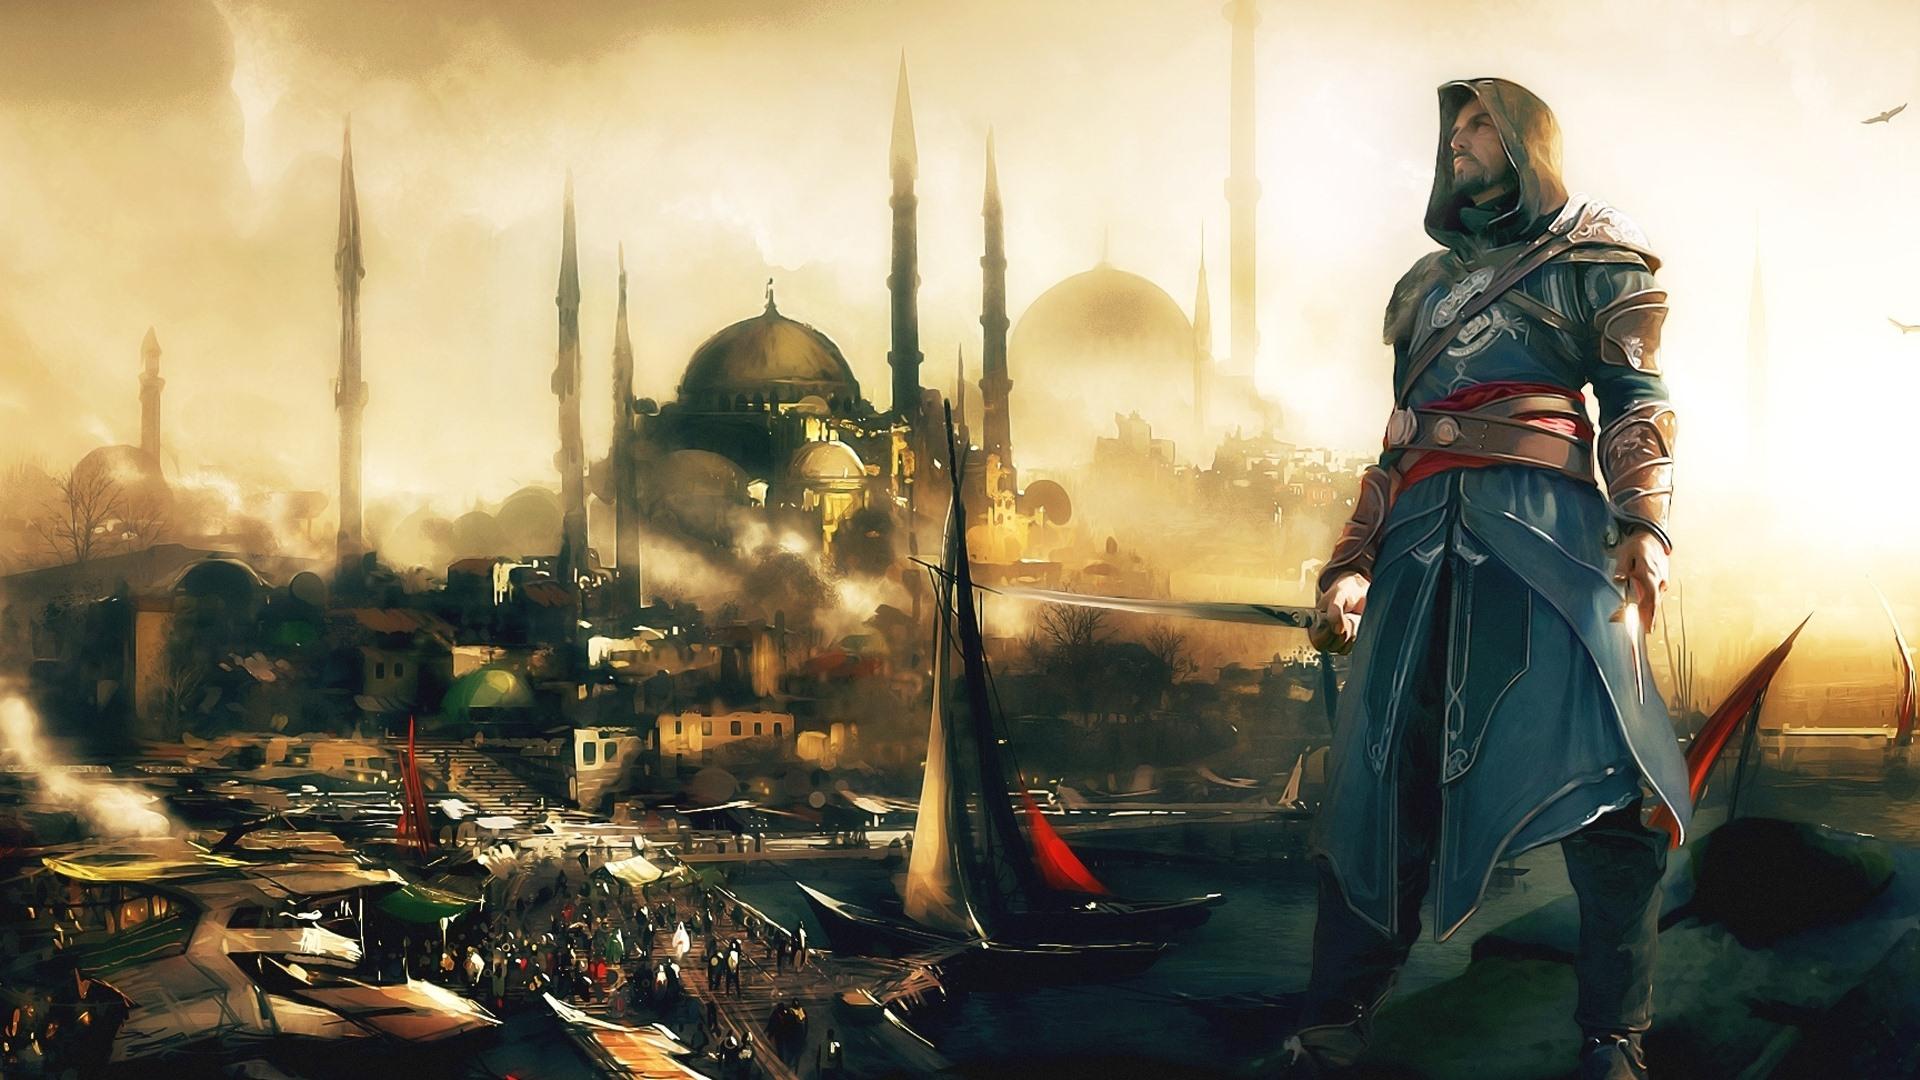 Assassins-Creed-Revelations-Computer-Desktop-wallpaper-wp3802582